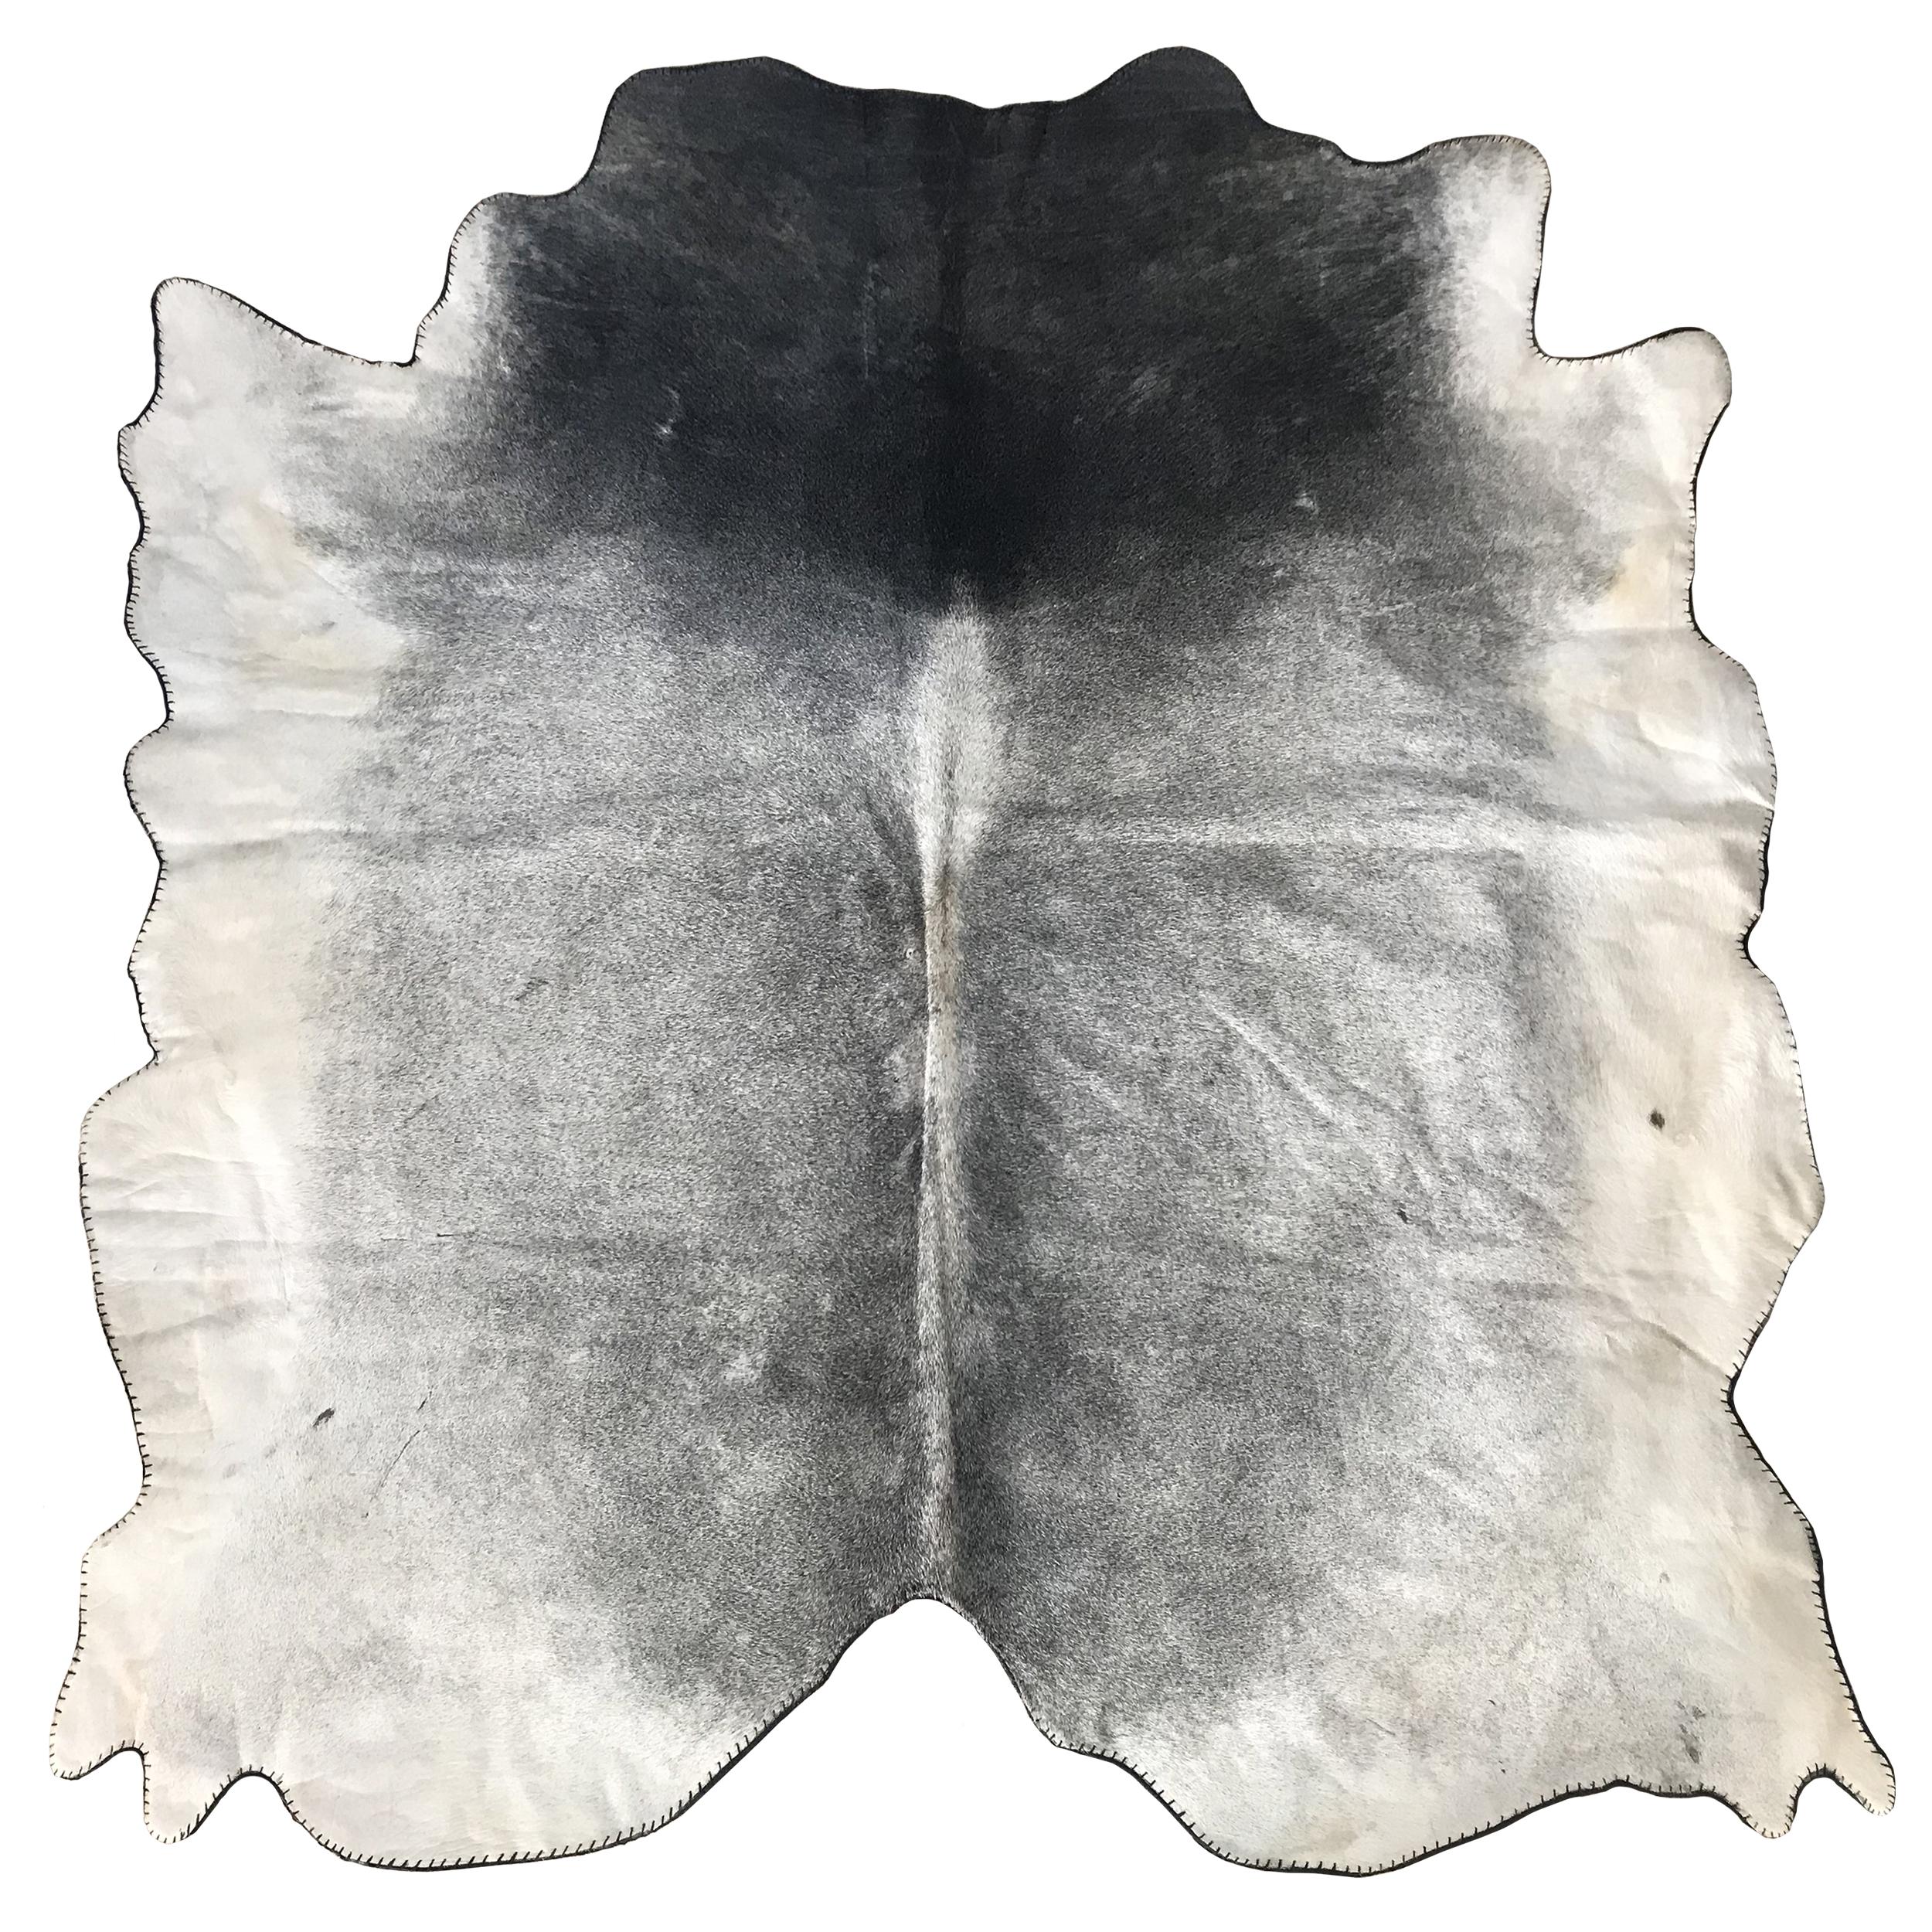 فرش پوست انارکارپت کد AN45P443